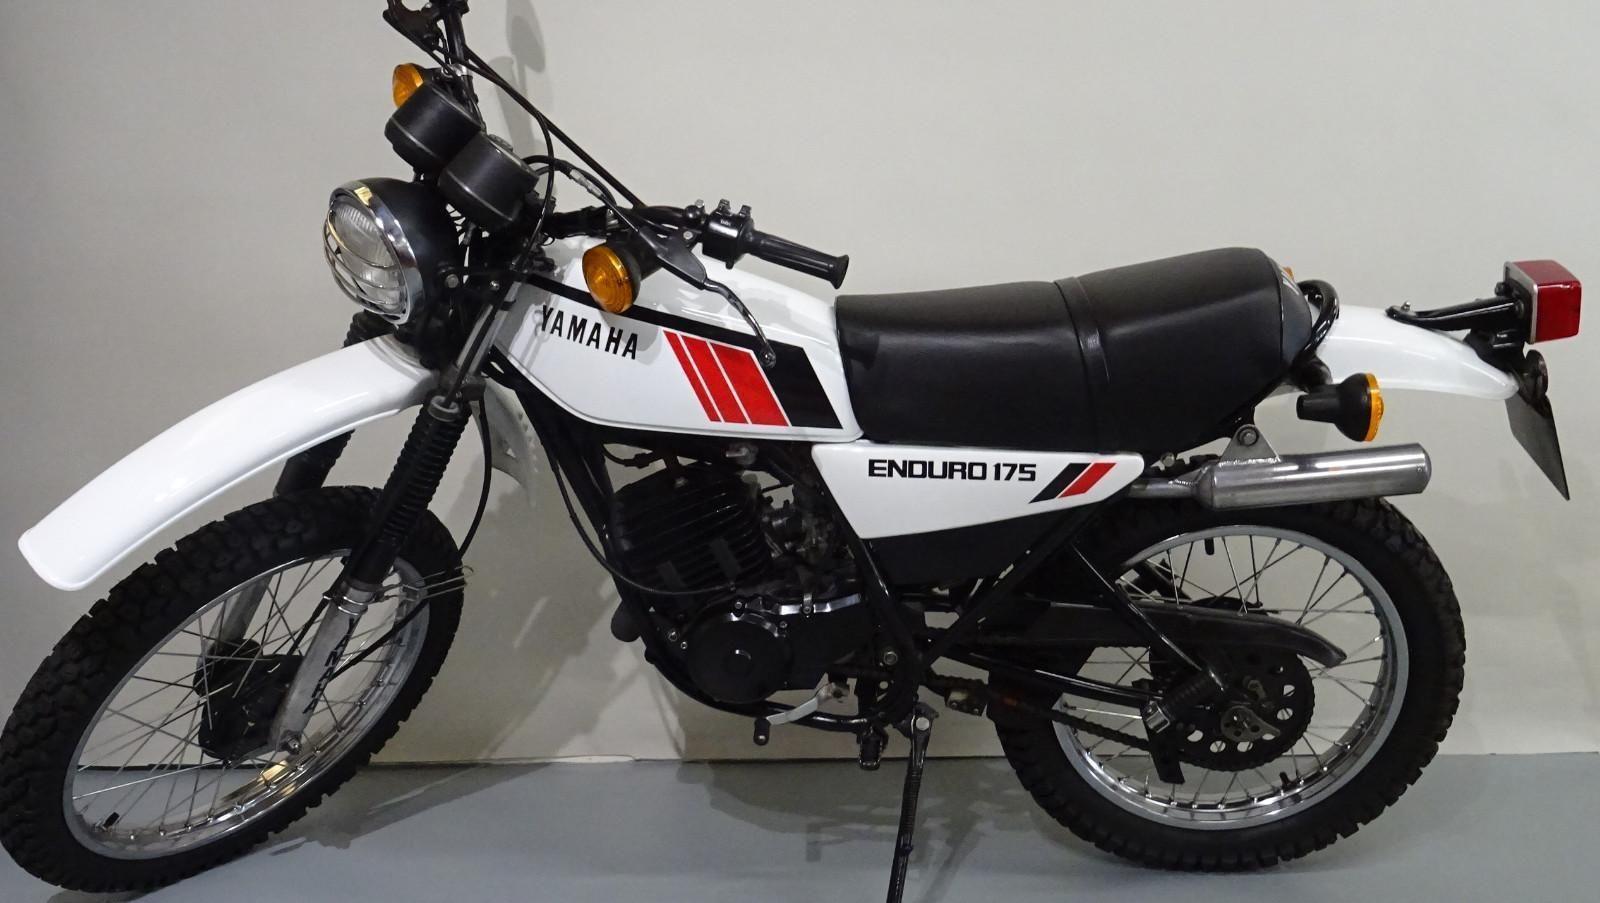 Yamaha dt175 fully restored stunning bike ebay for Yamaha sun classic parts